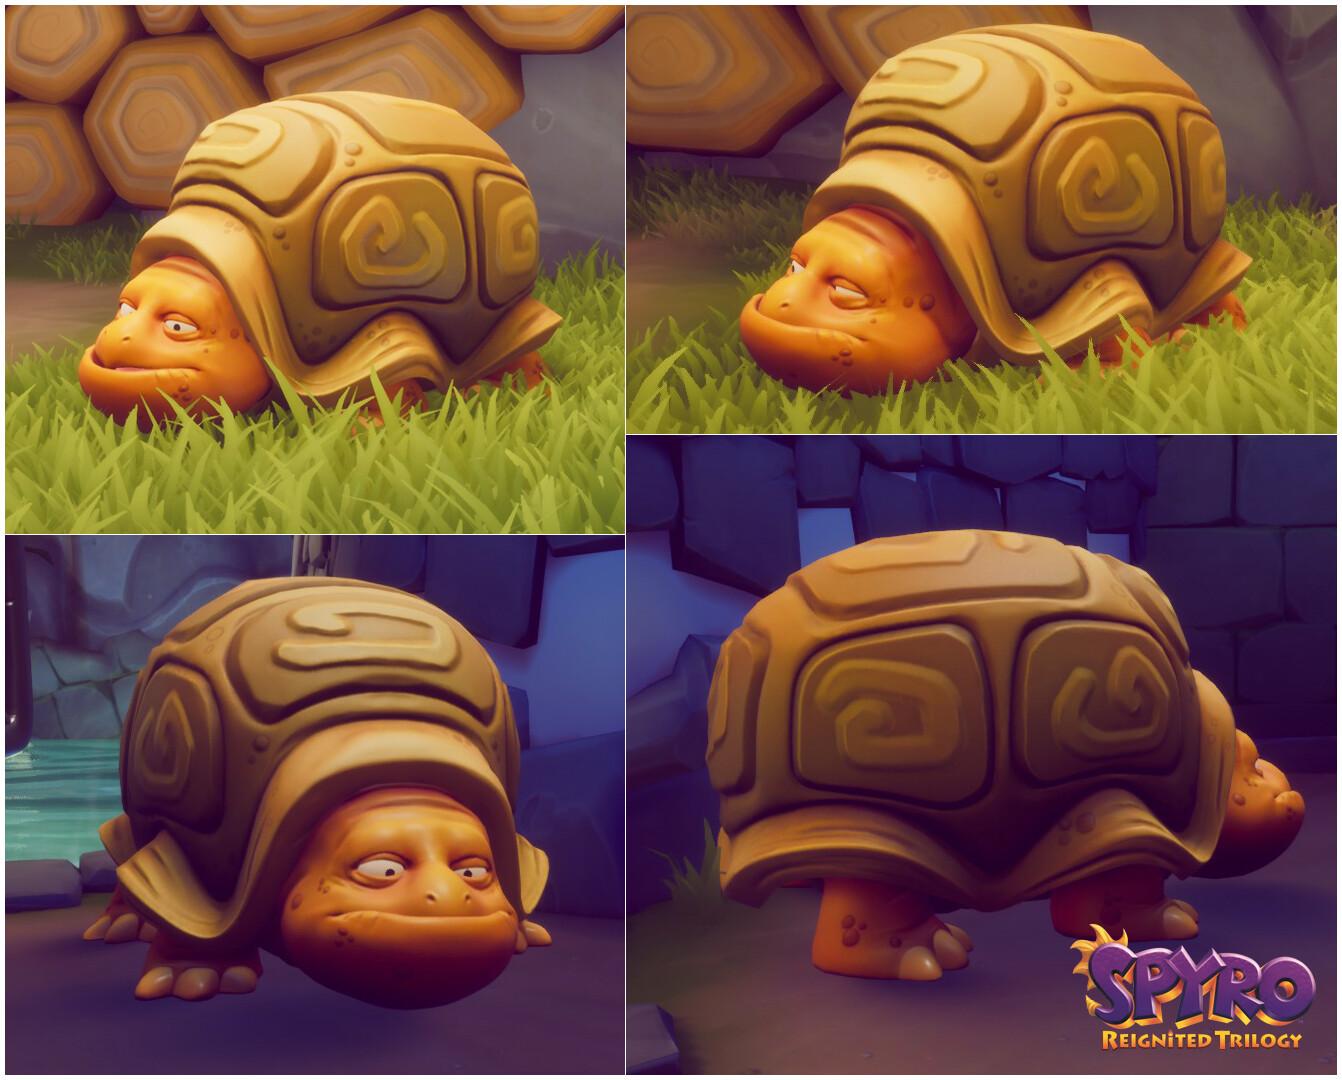 Alexandra jackson spyrotrilogy turtle collage